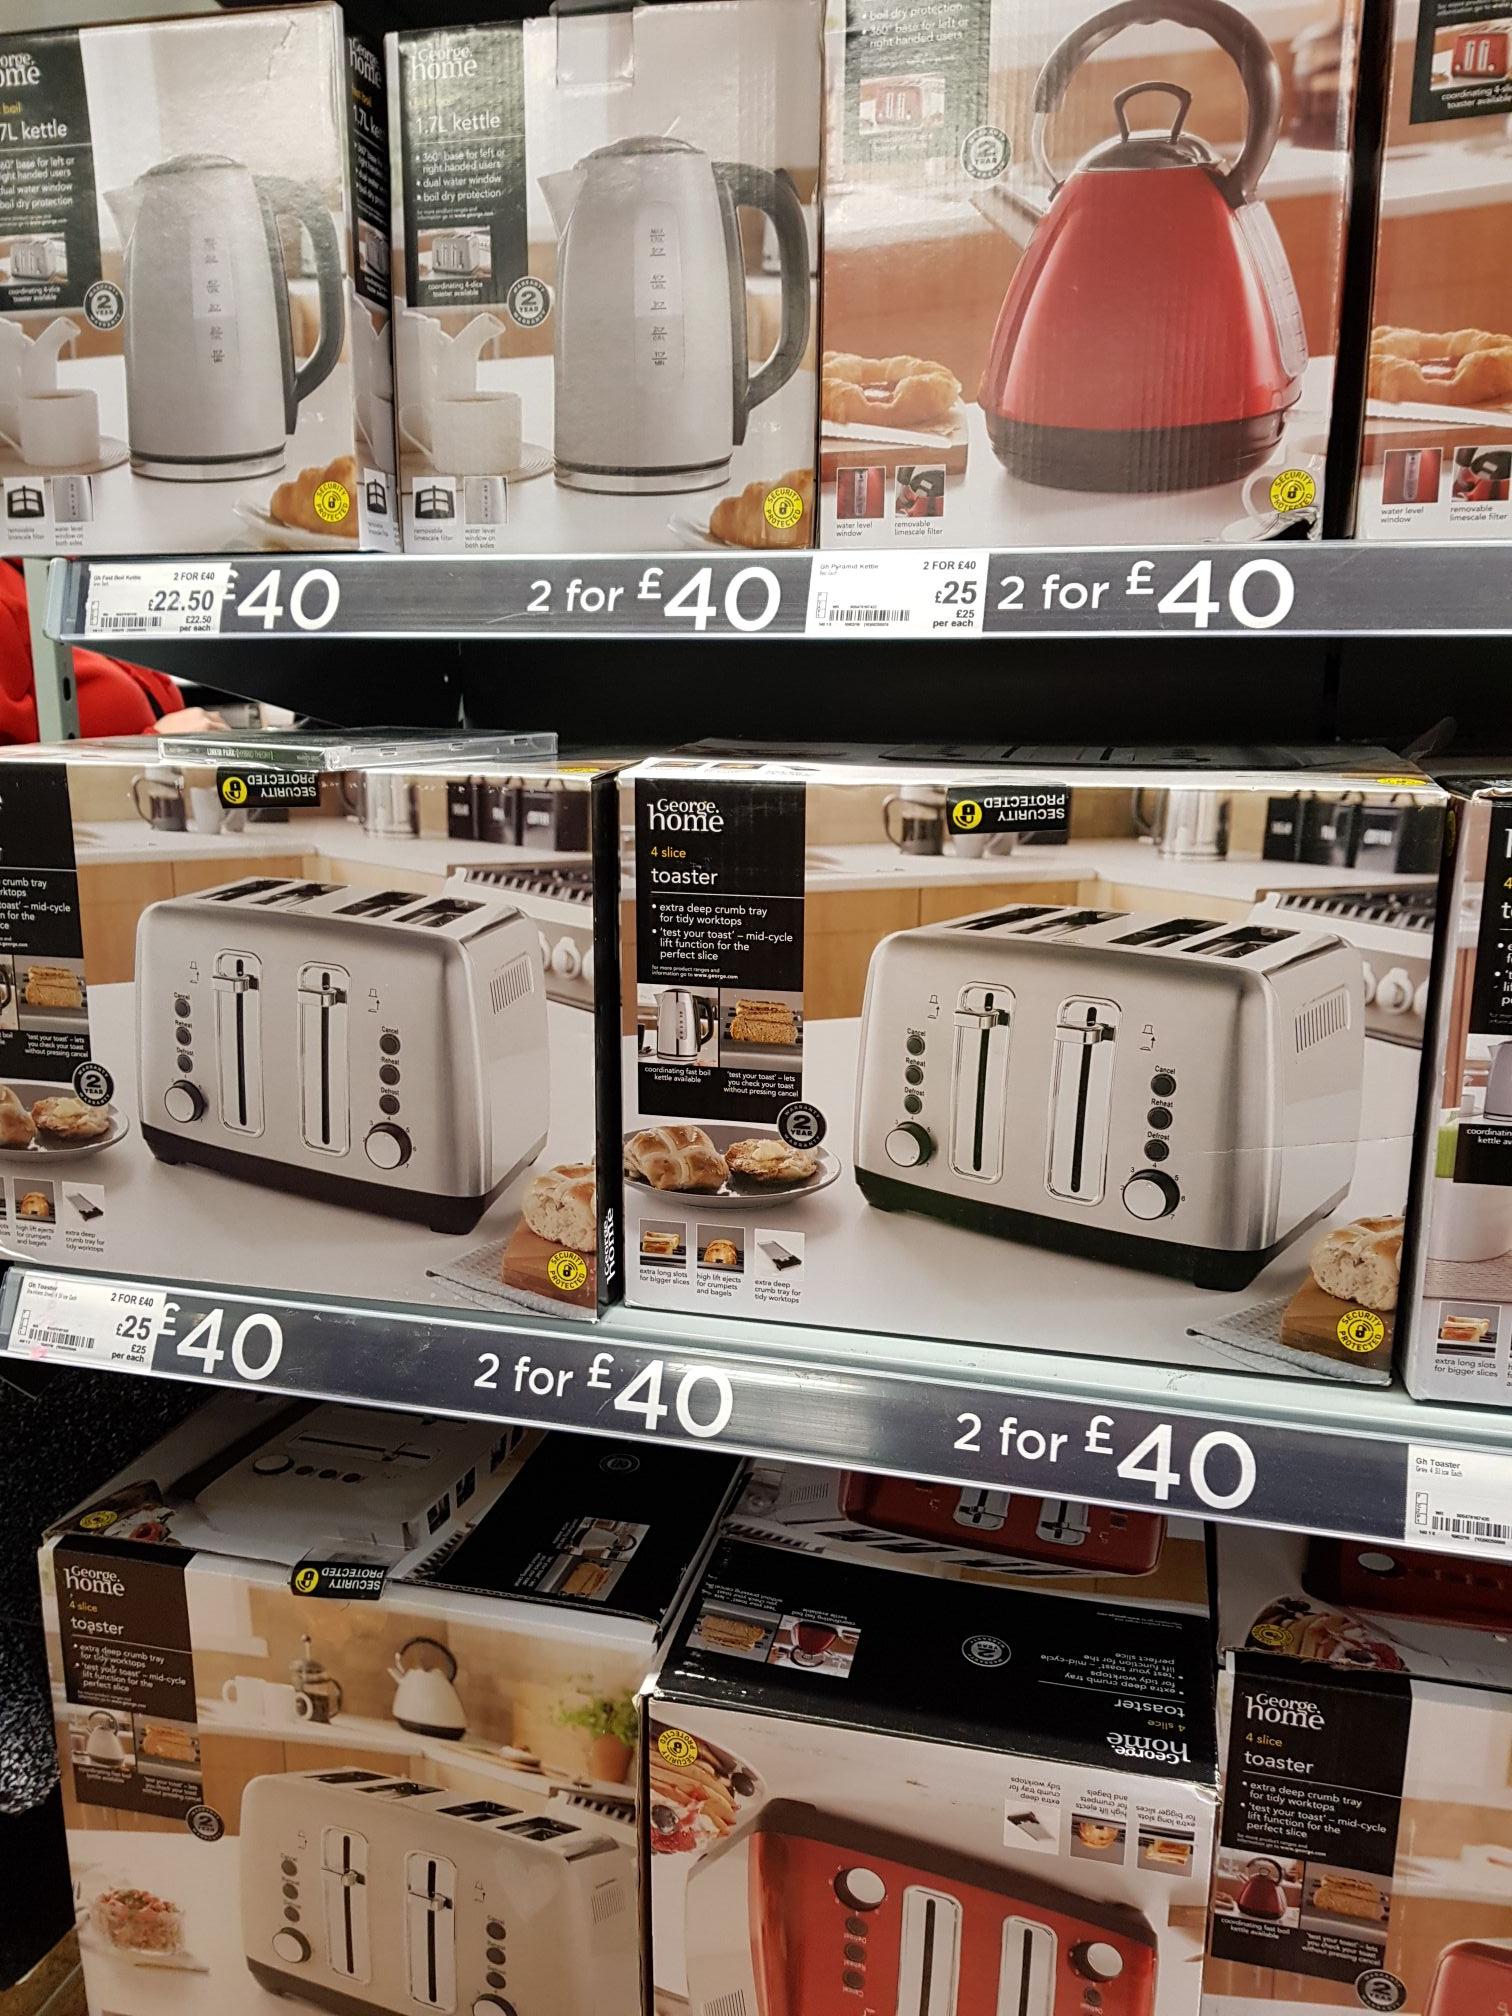 Asda - 2 home appliances for £40